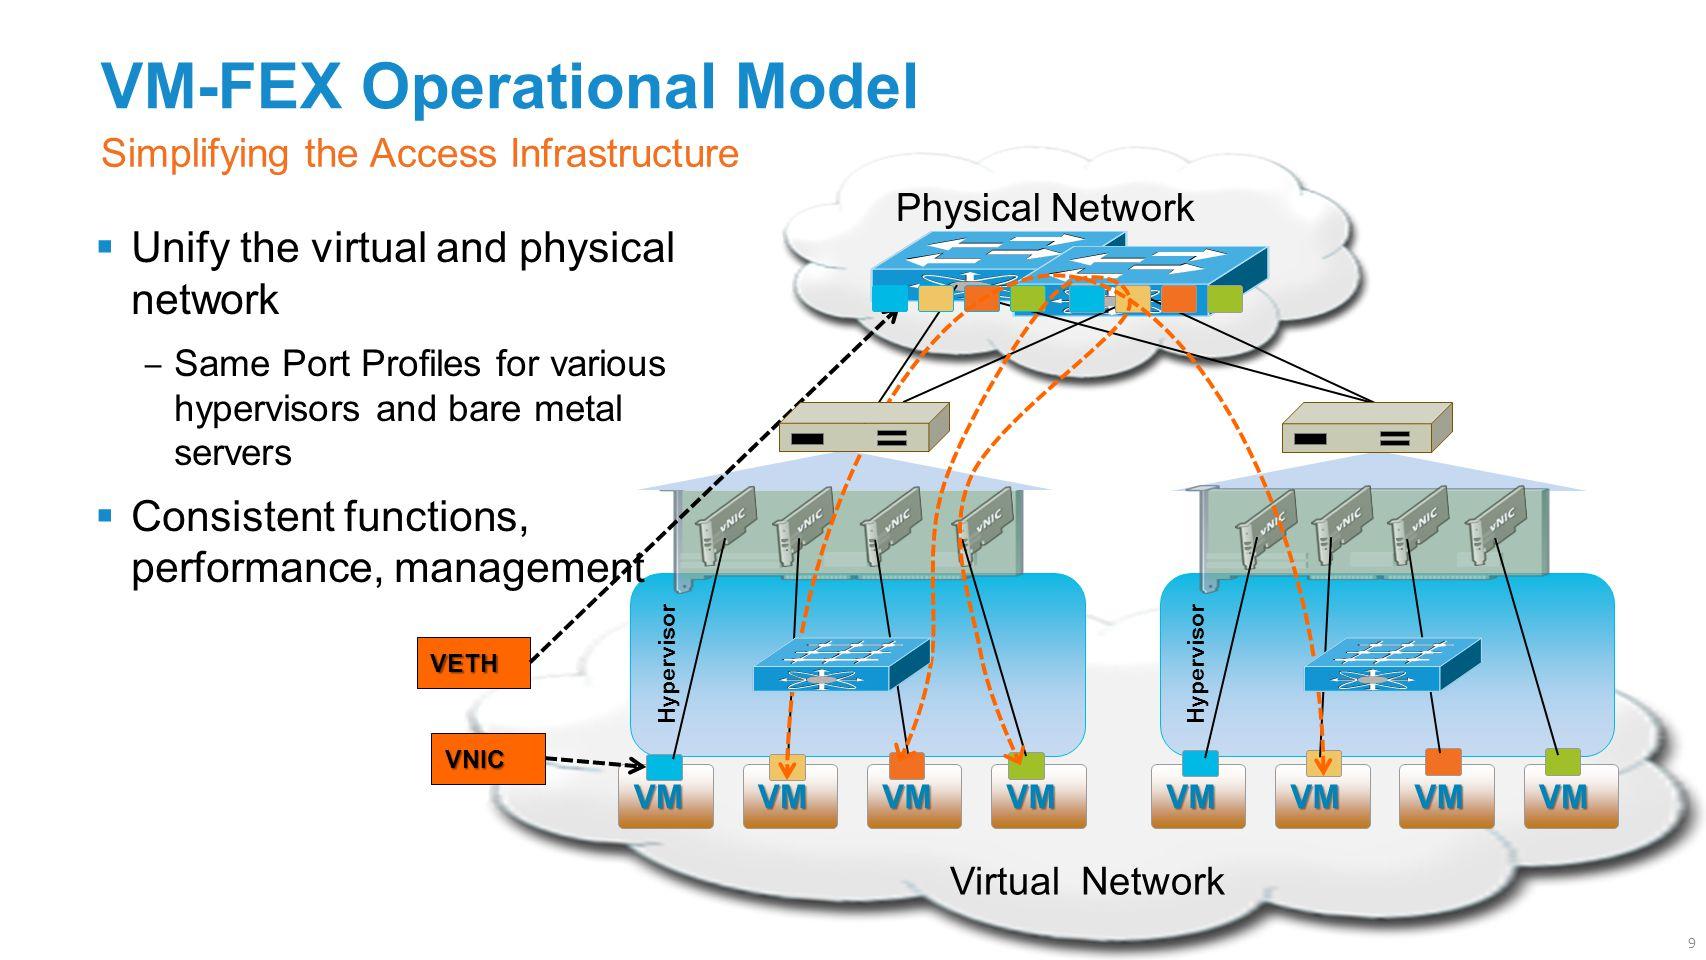 VM-FEX Operational Model Simplifying the Access Infrastructure Physical Network Virtual Network Hypervisor VMVMVMVMVMVMVMVM VETH VNIC  Unify the virtual and physical network ‒ Same Port Profiles for various hypervisors and bare metal servers  Consistent functions, performance, management 9